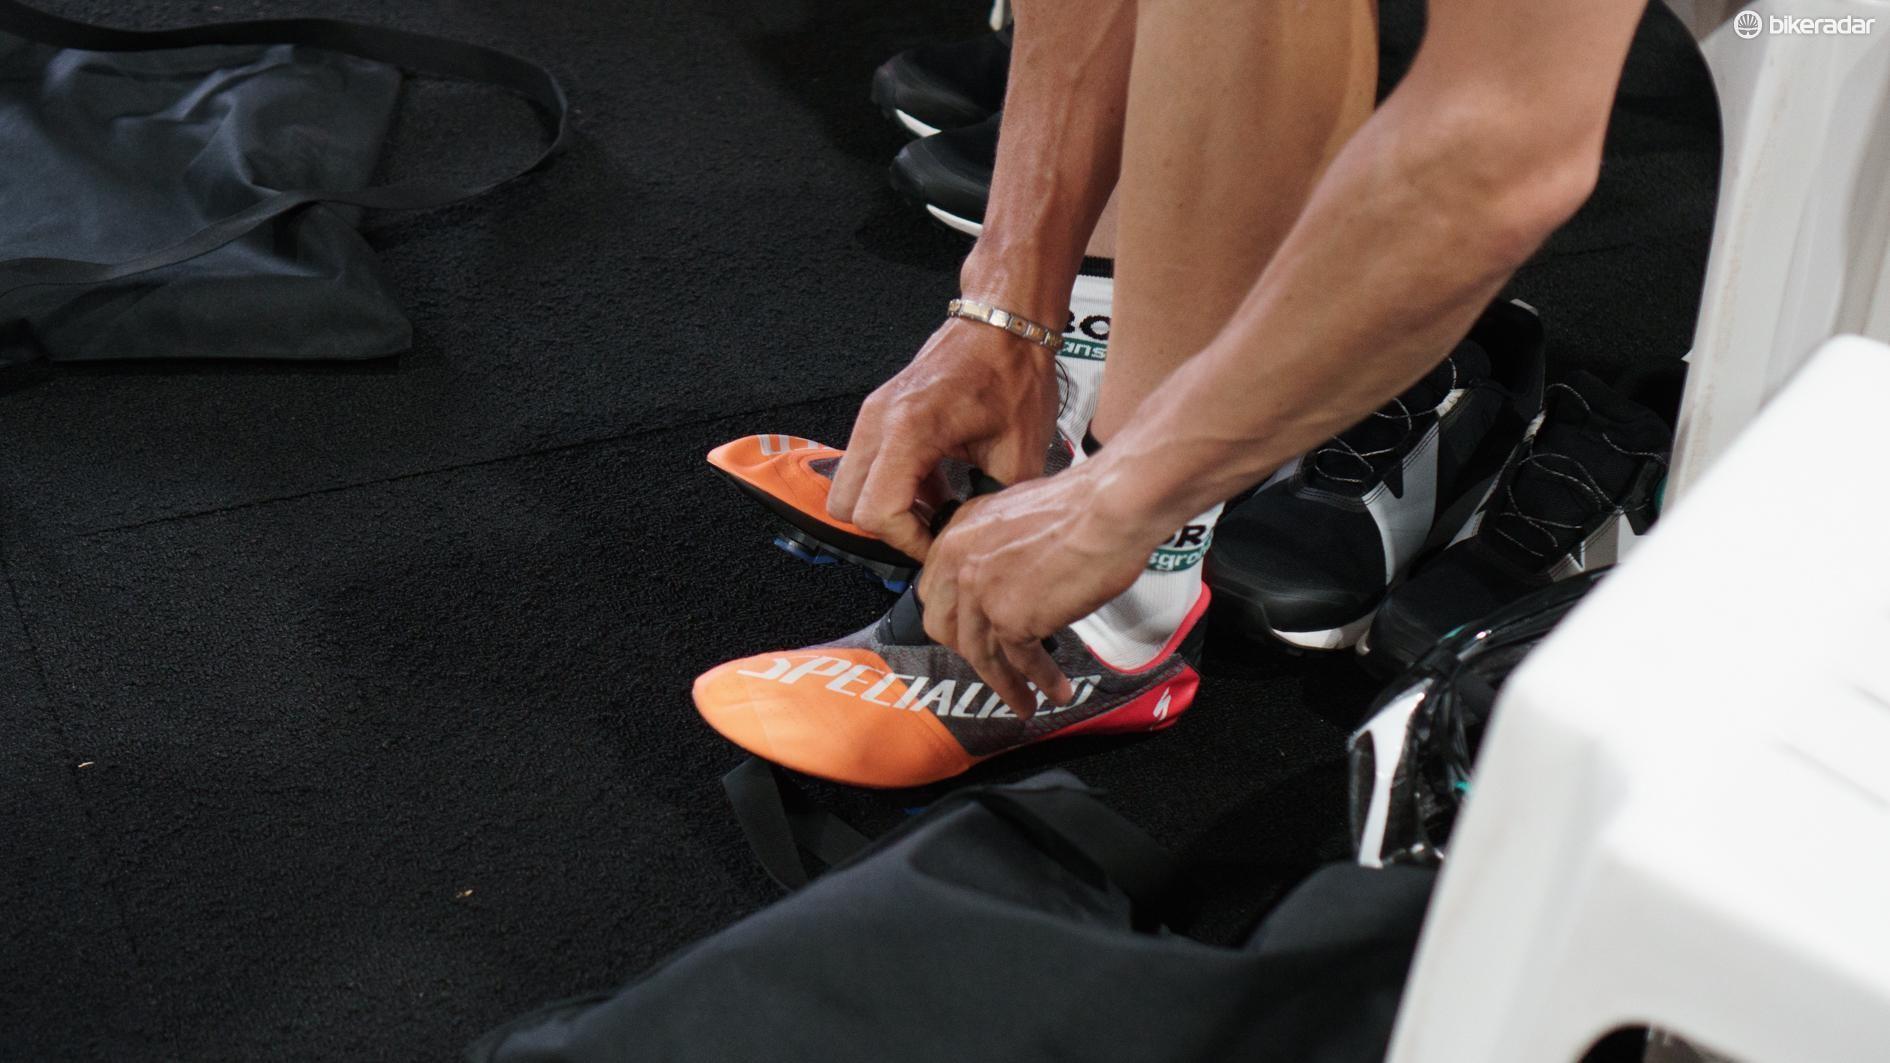 05_specialized-lightweight-climber-shoe-1547082703220-3ebm8jloz82-47f3a7a